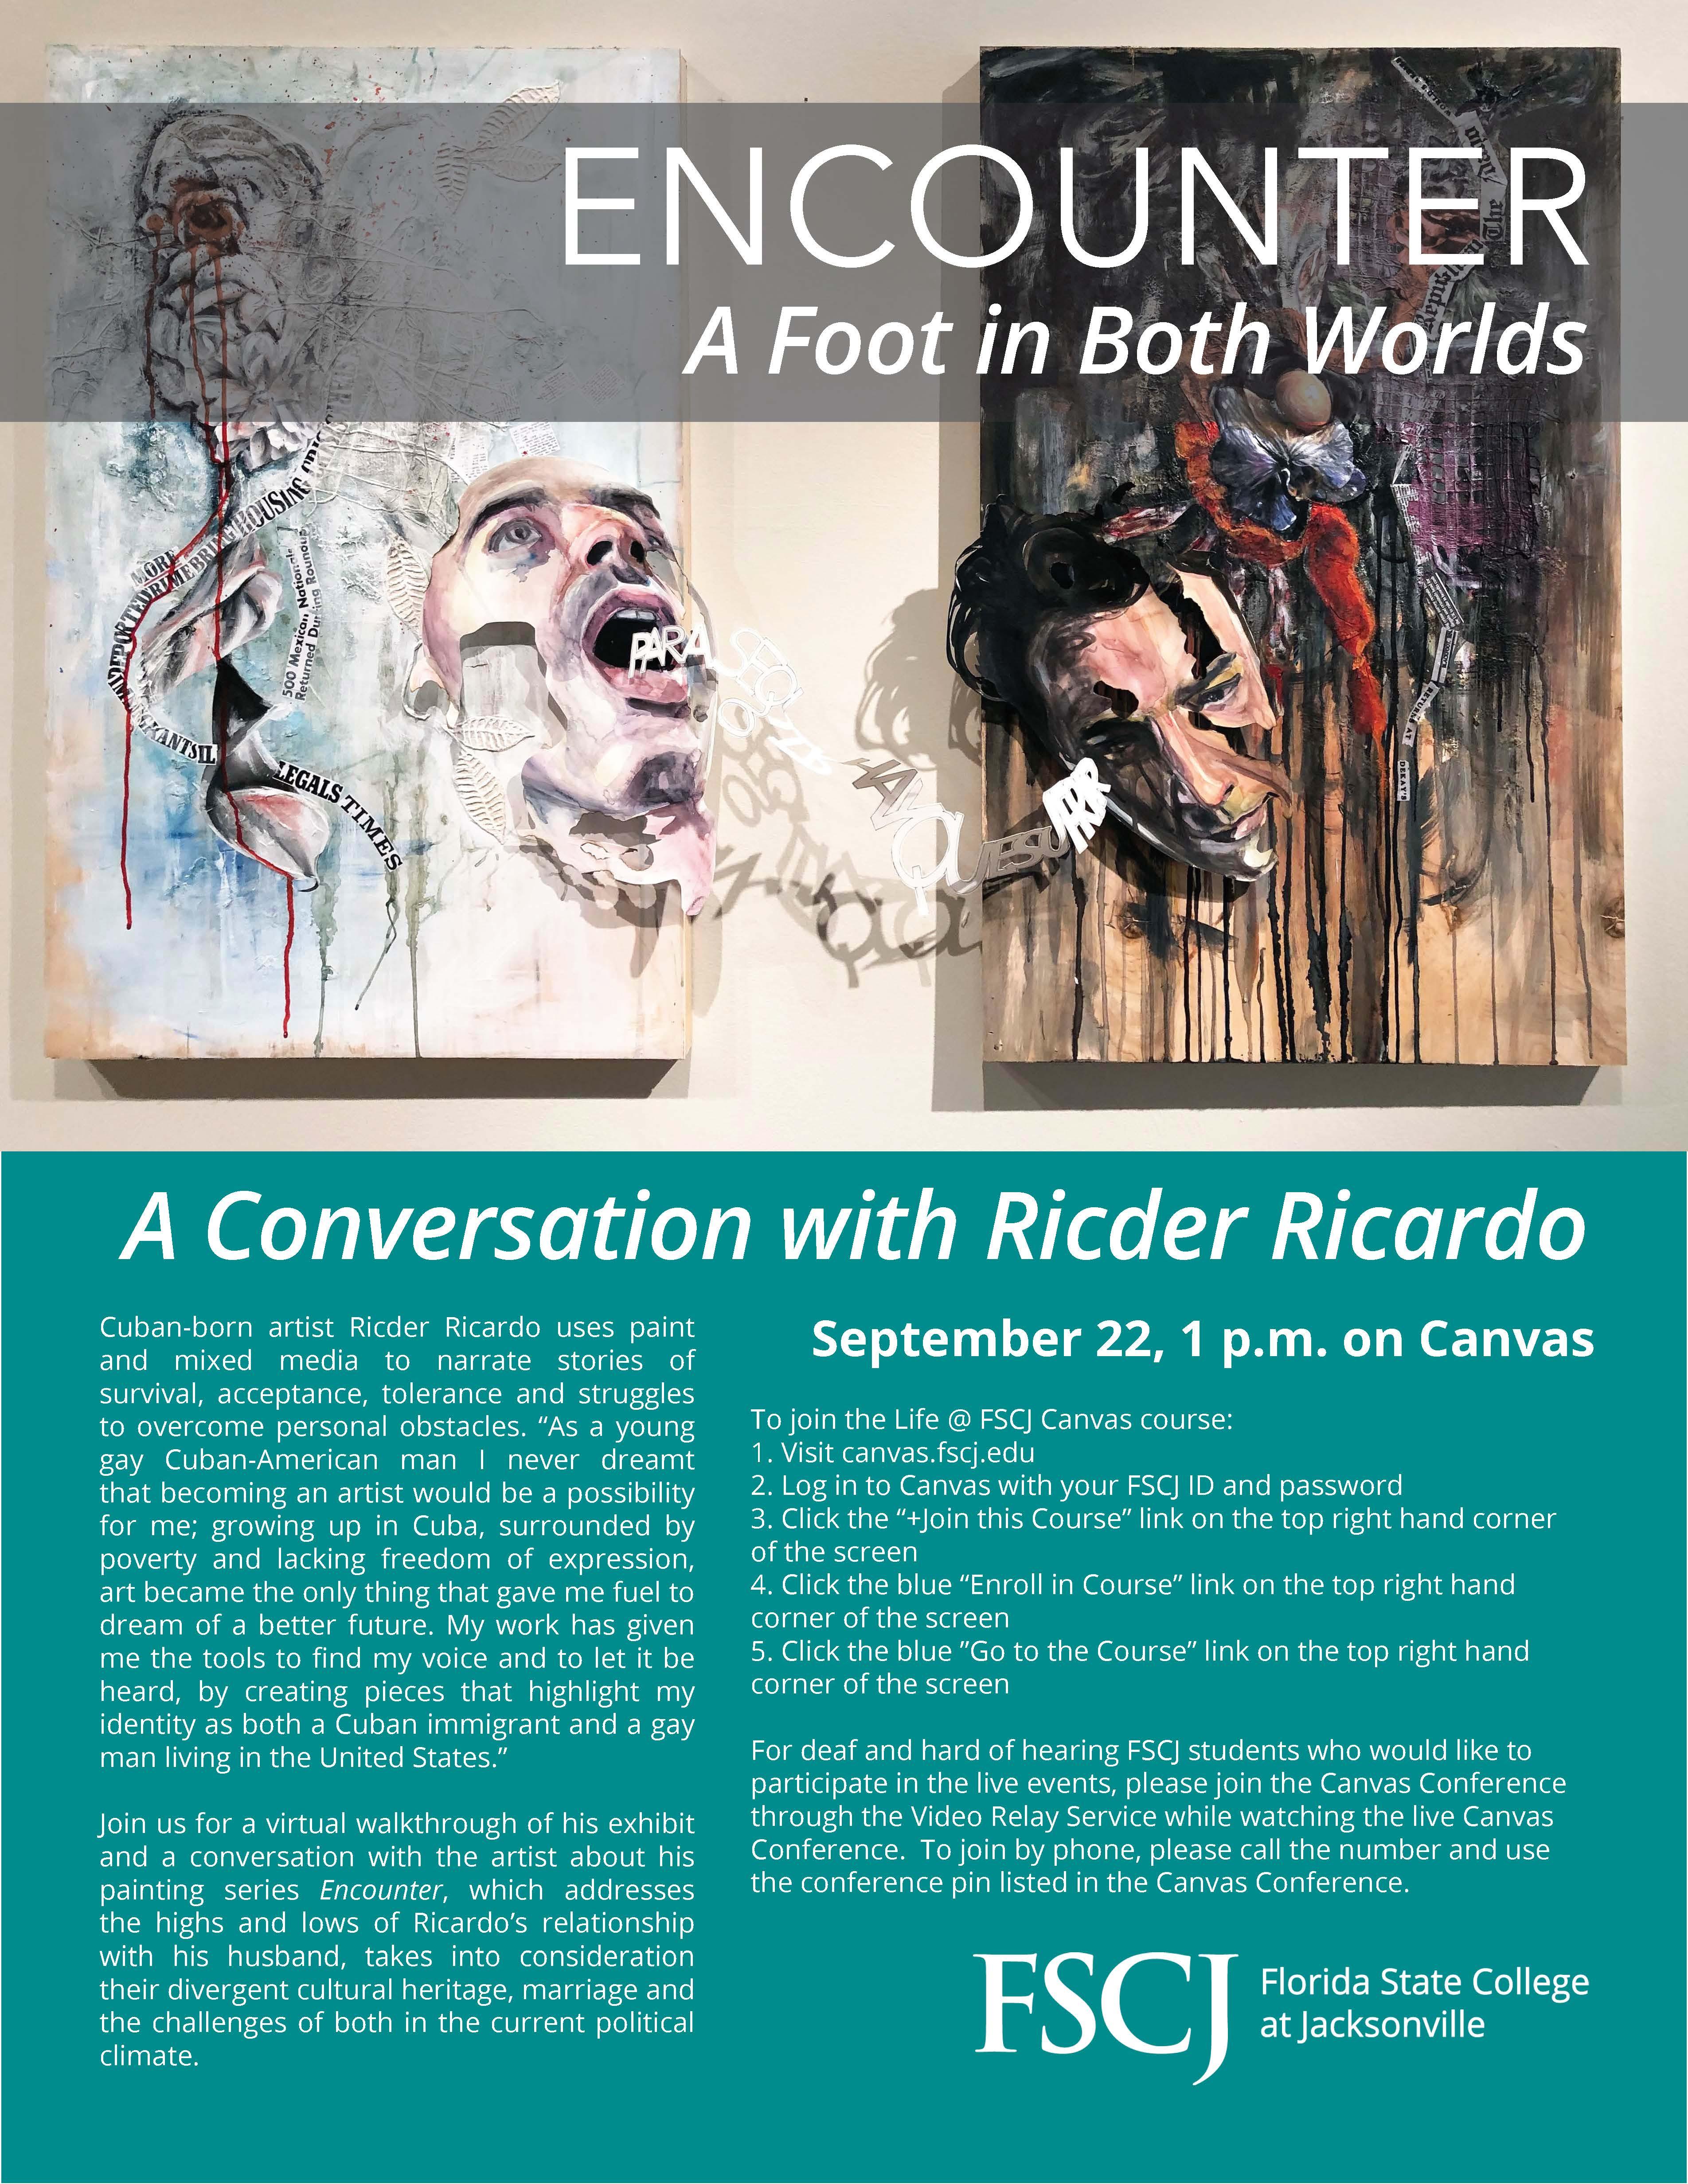 A Conversation with Ricder Ricardo: An LLC/FSCJ Gallery Event